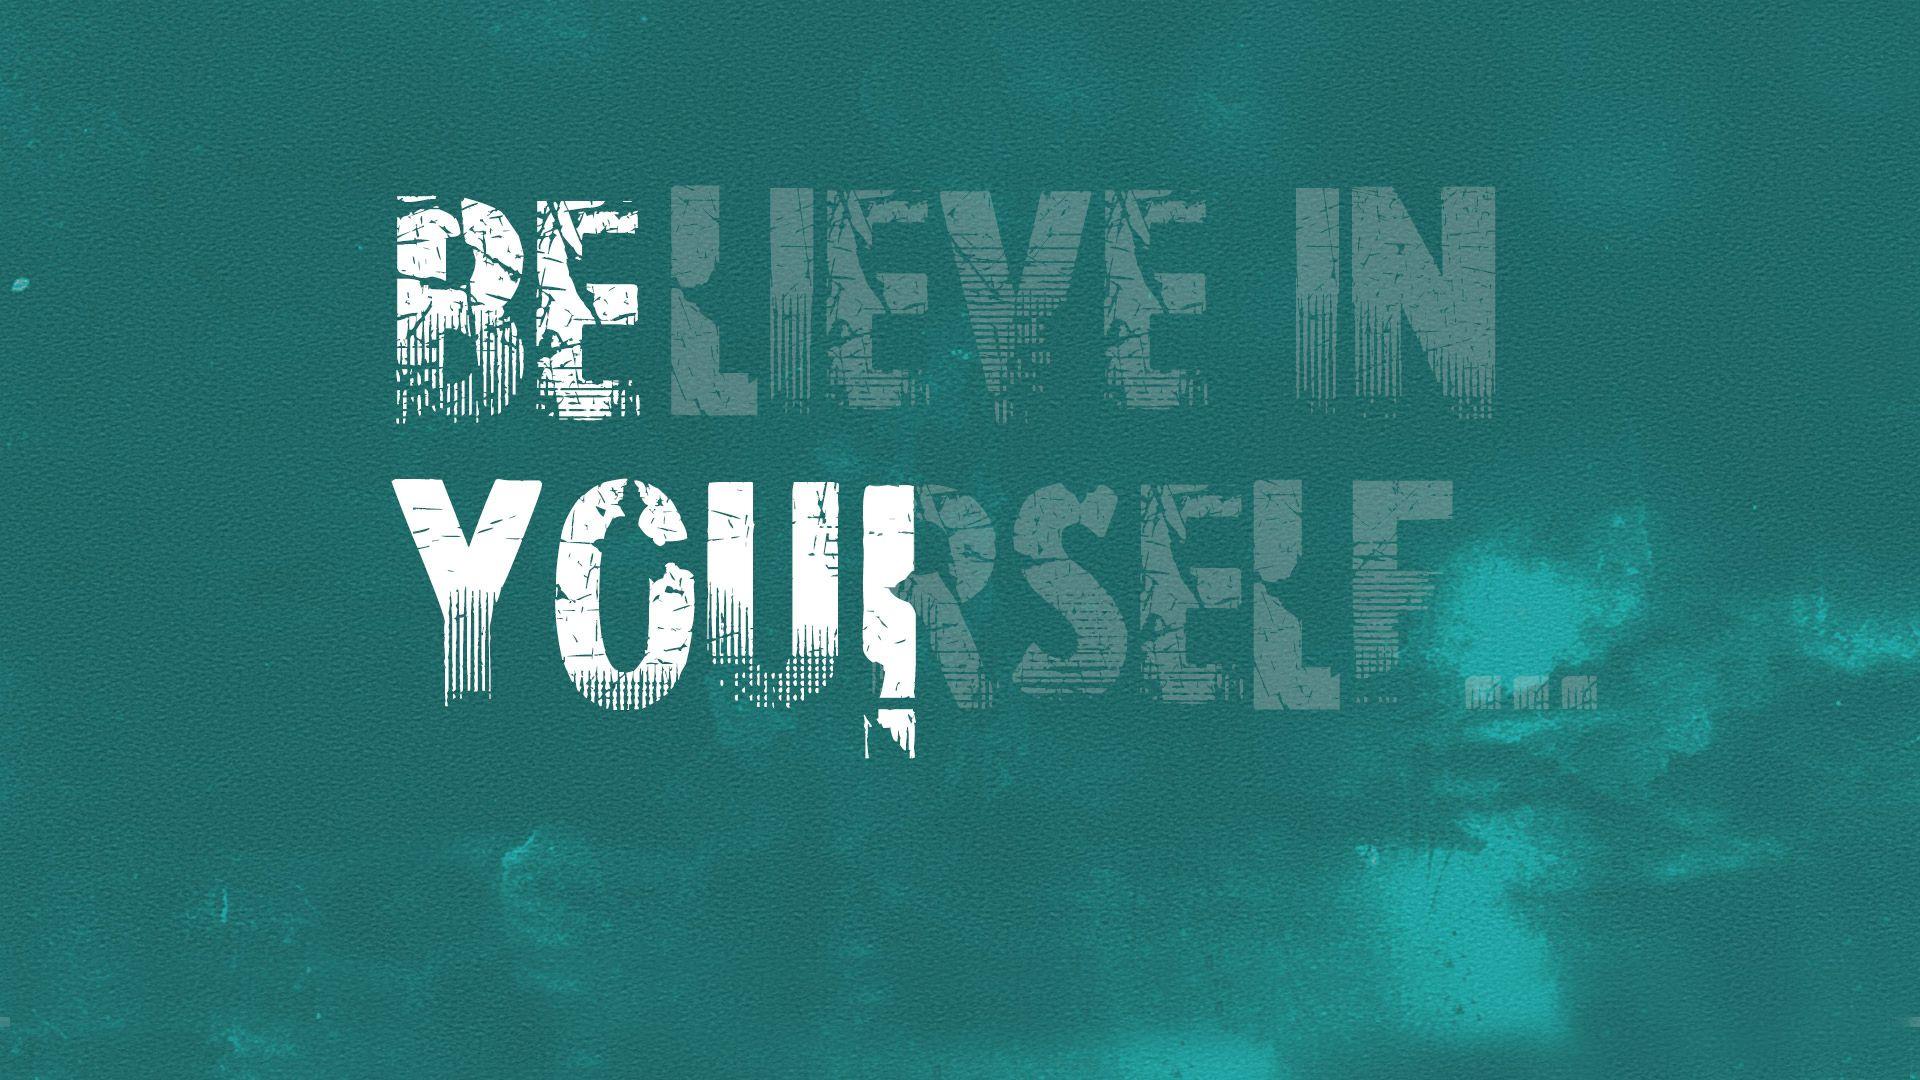 Believe In Yourself Motivational Wallpaper Jpg 1920 1080 Inspirational Quotes Wallpapers Motivational Wallpapers Hd Motivational Quotes Wallpaper